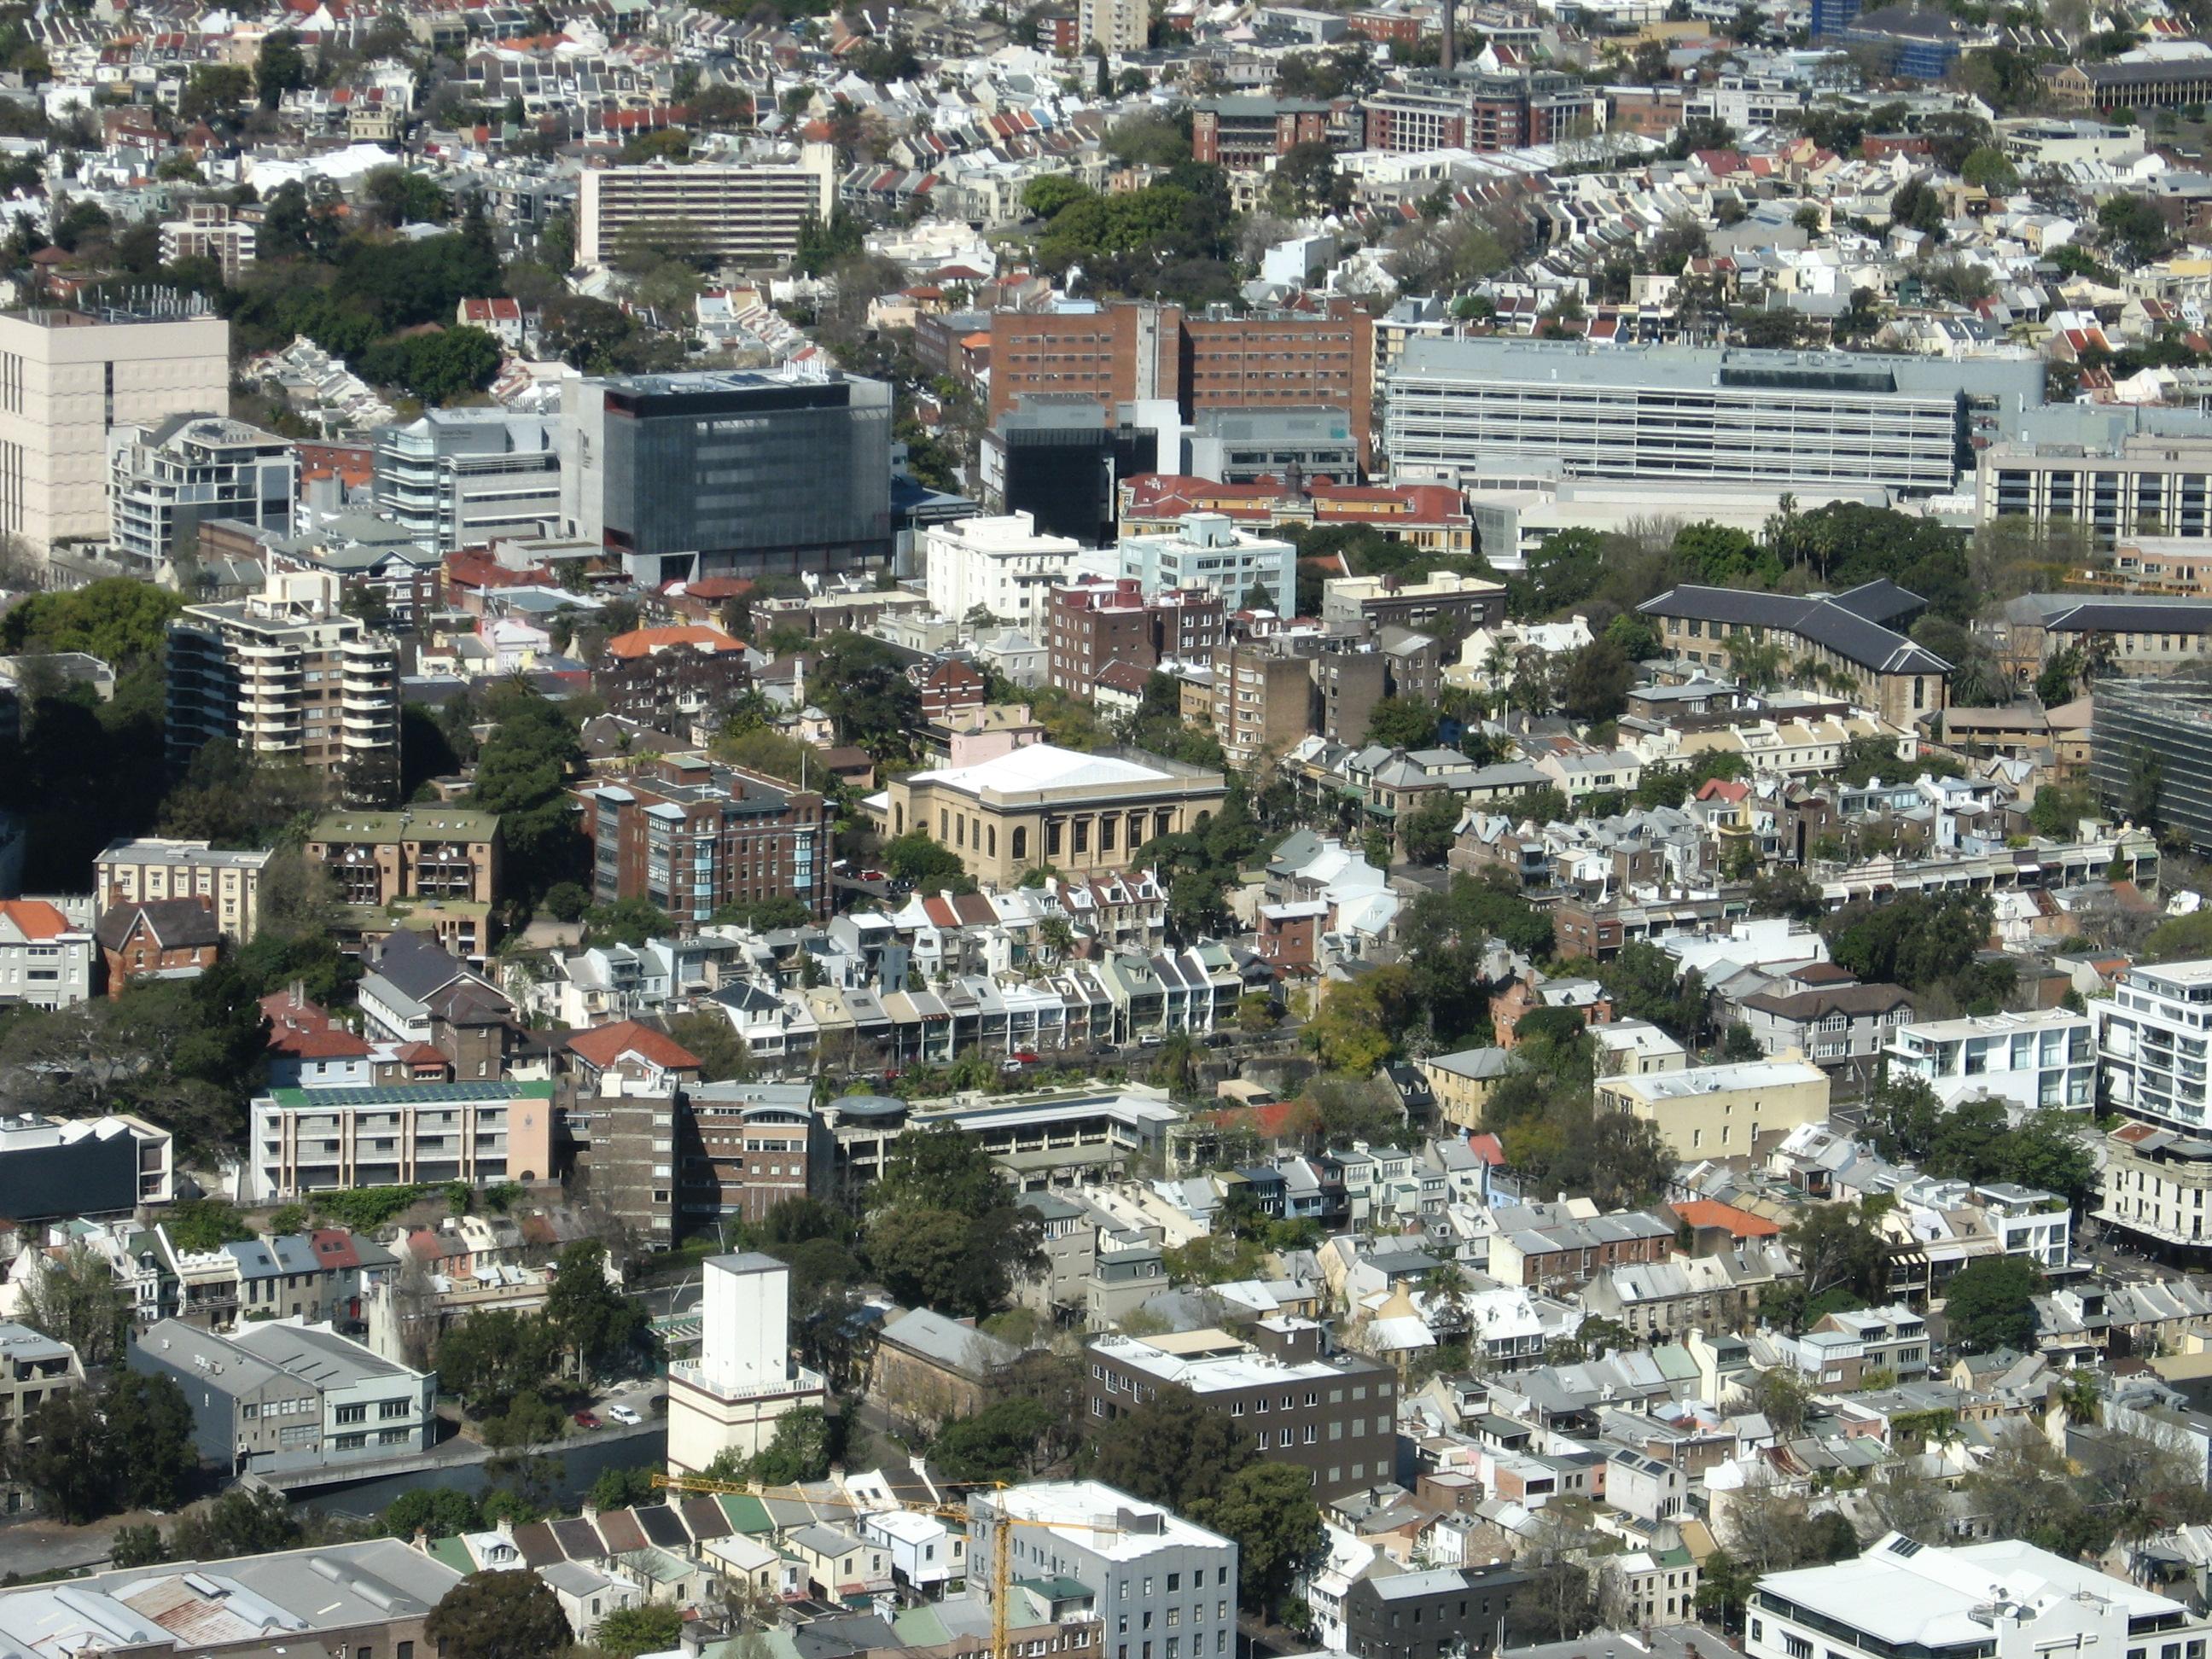 Aerial view of Darlinghurst, New South Wales.jpg